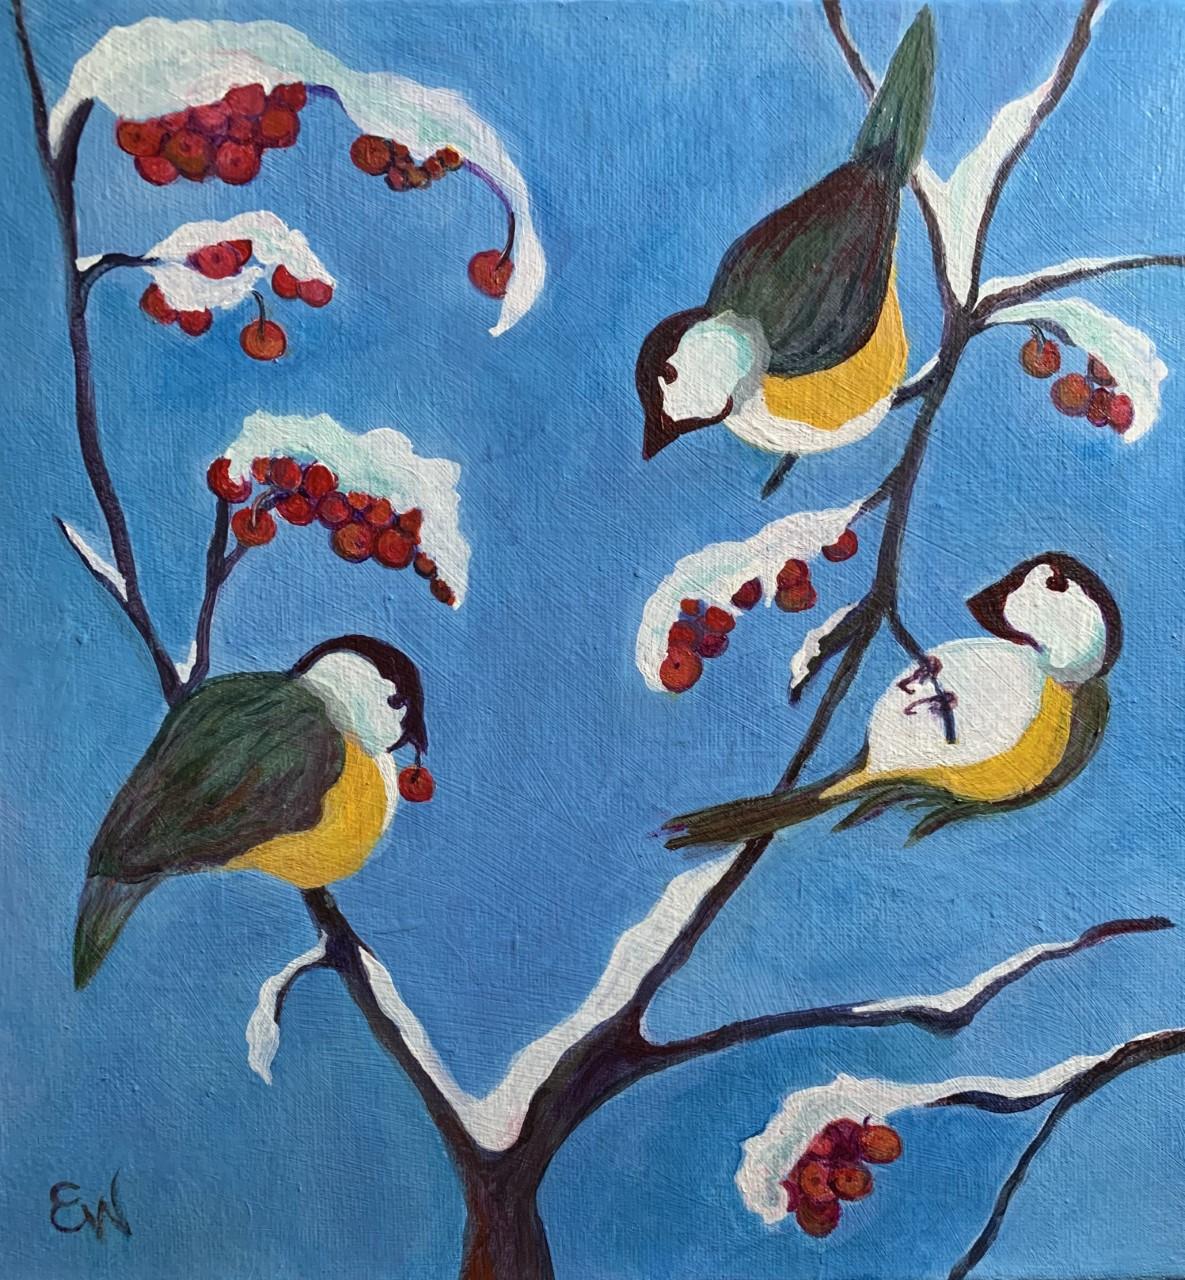 Painting By Eileen Westphal